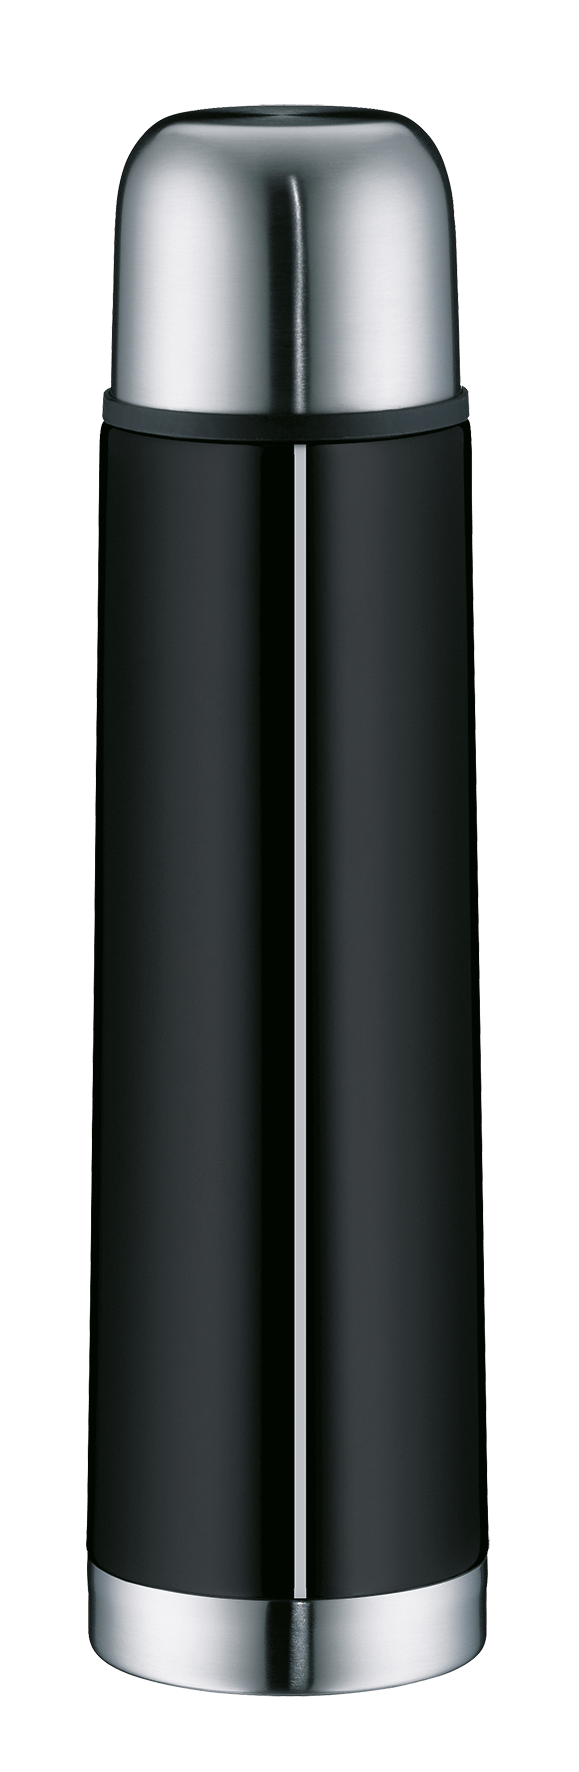 Alfi-Isotherm-Eco-0-75-L-Schwarz